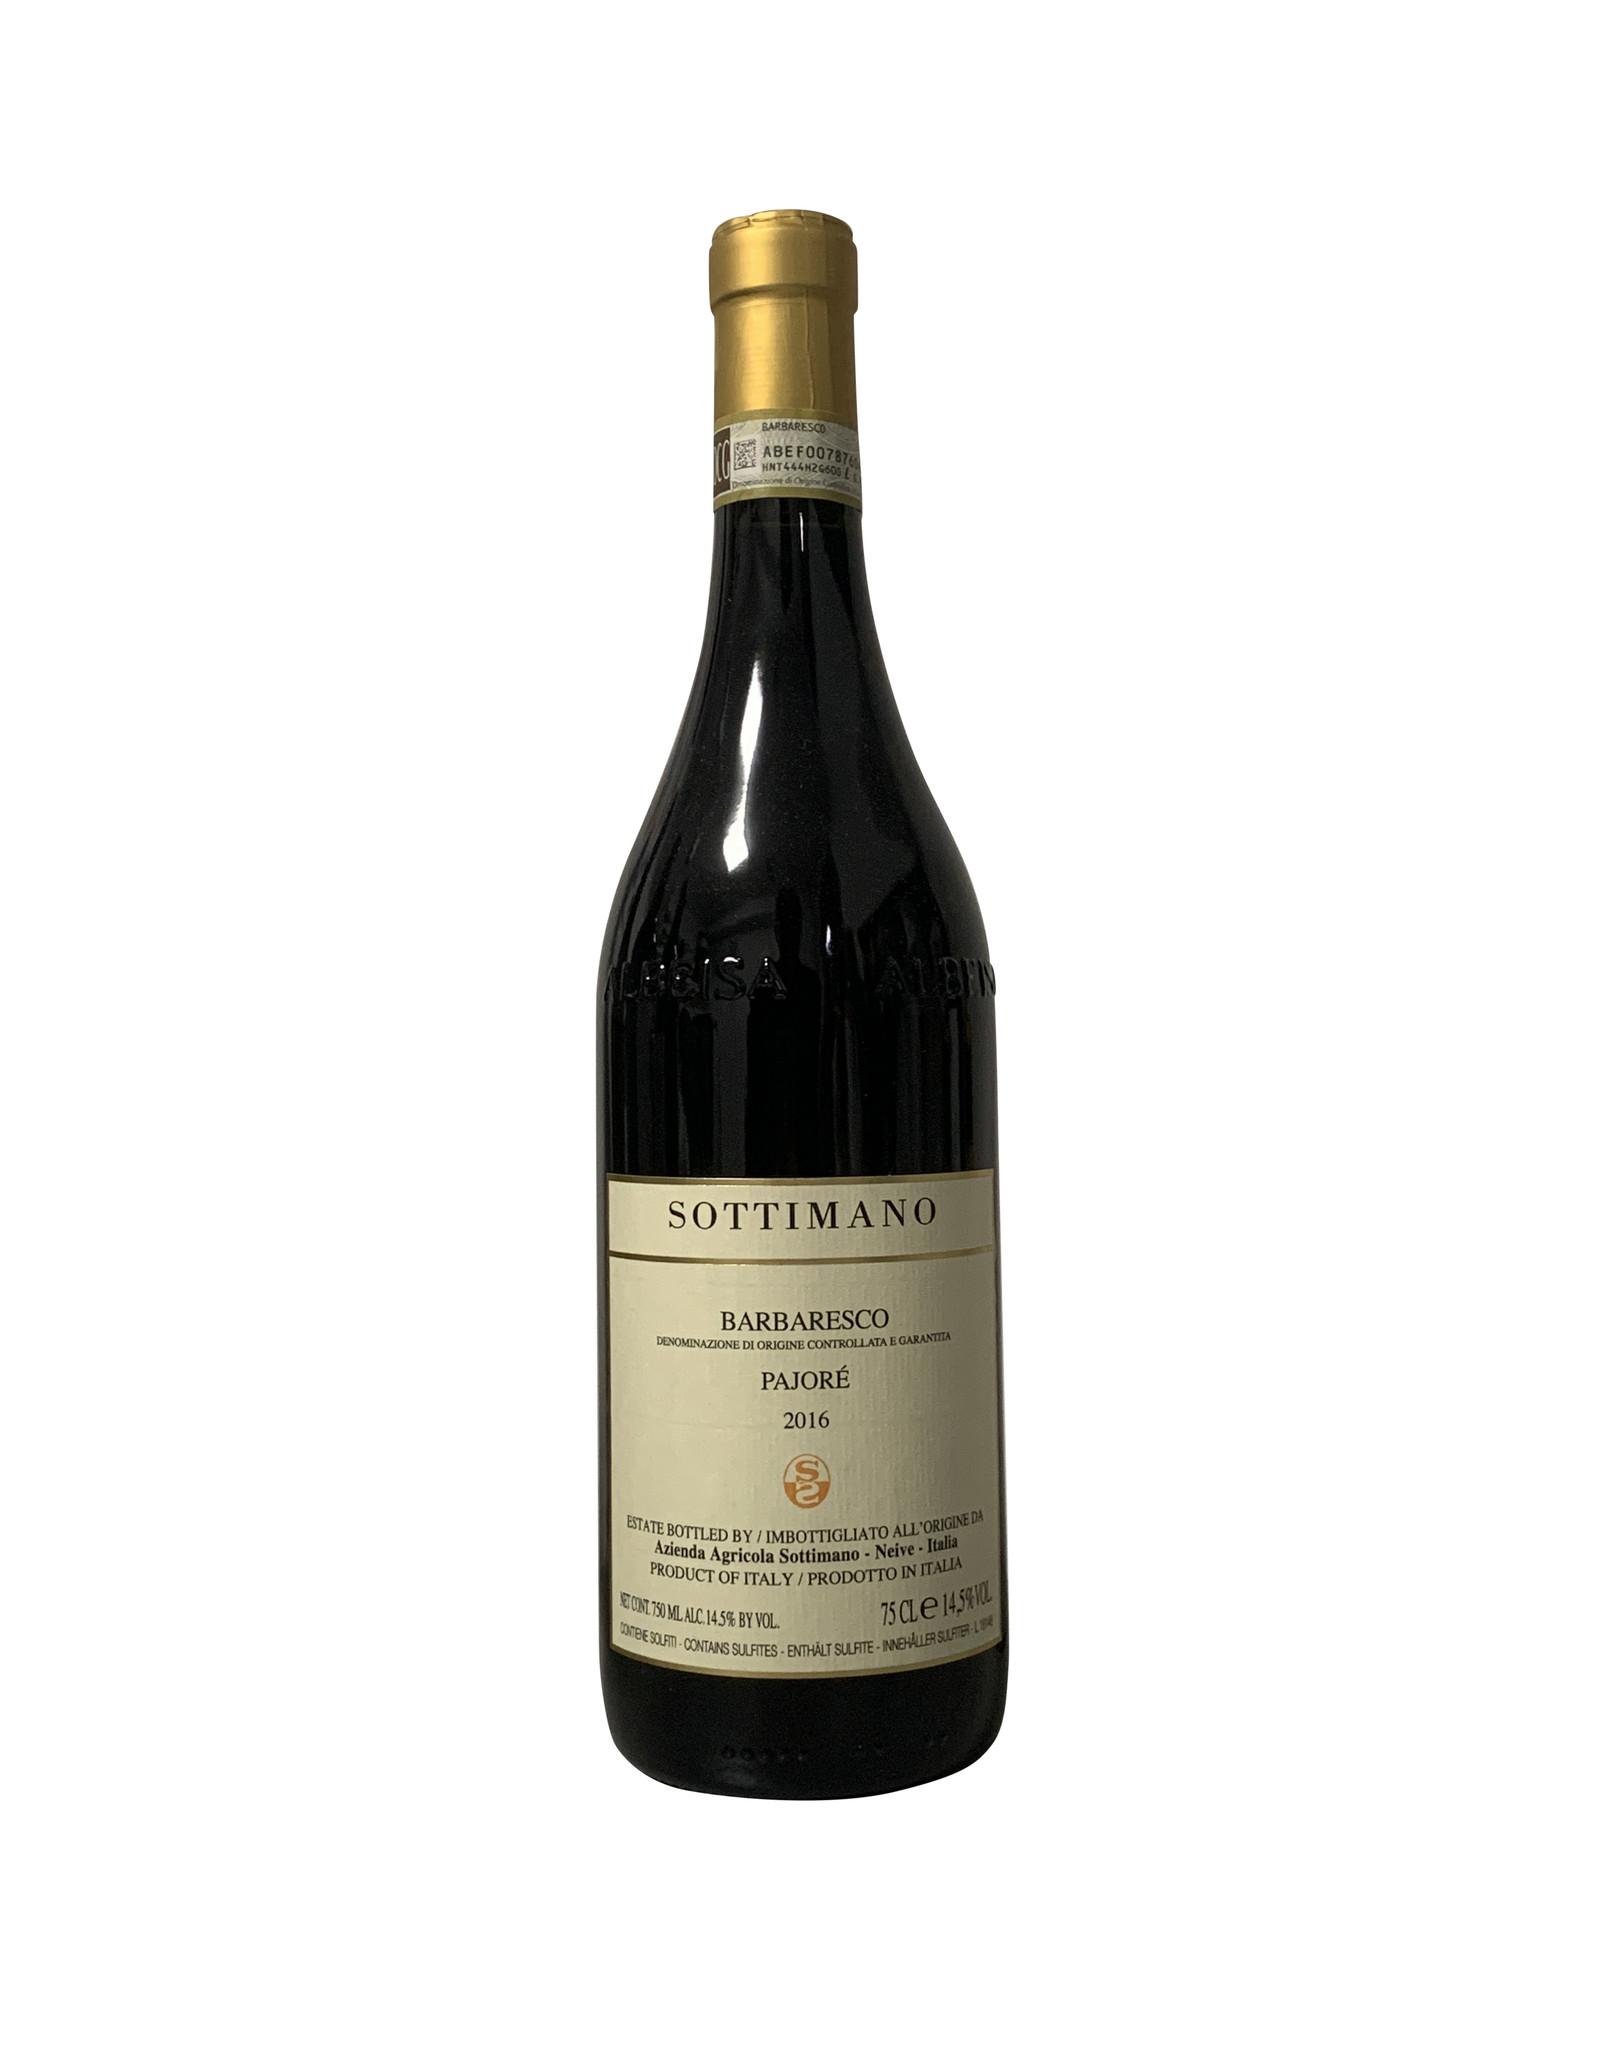 "Sottimano Sottimano Barbaresco ""Pajore"" 2016, Piedmont, Italy (750mL)"